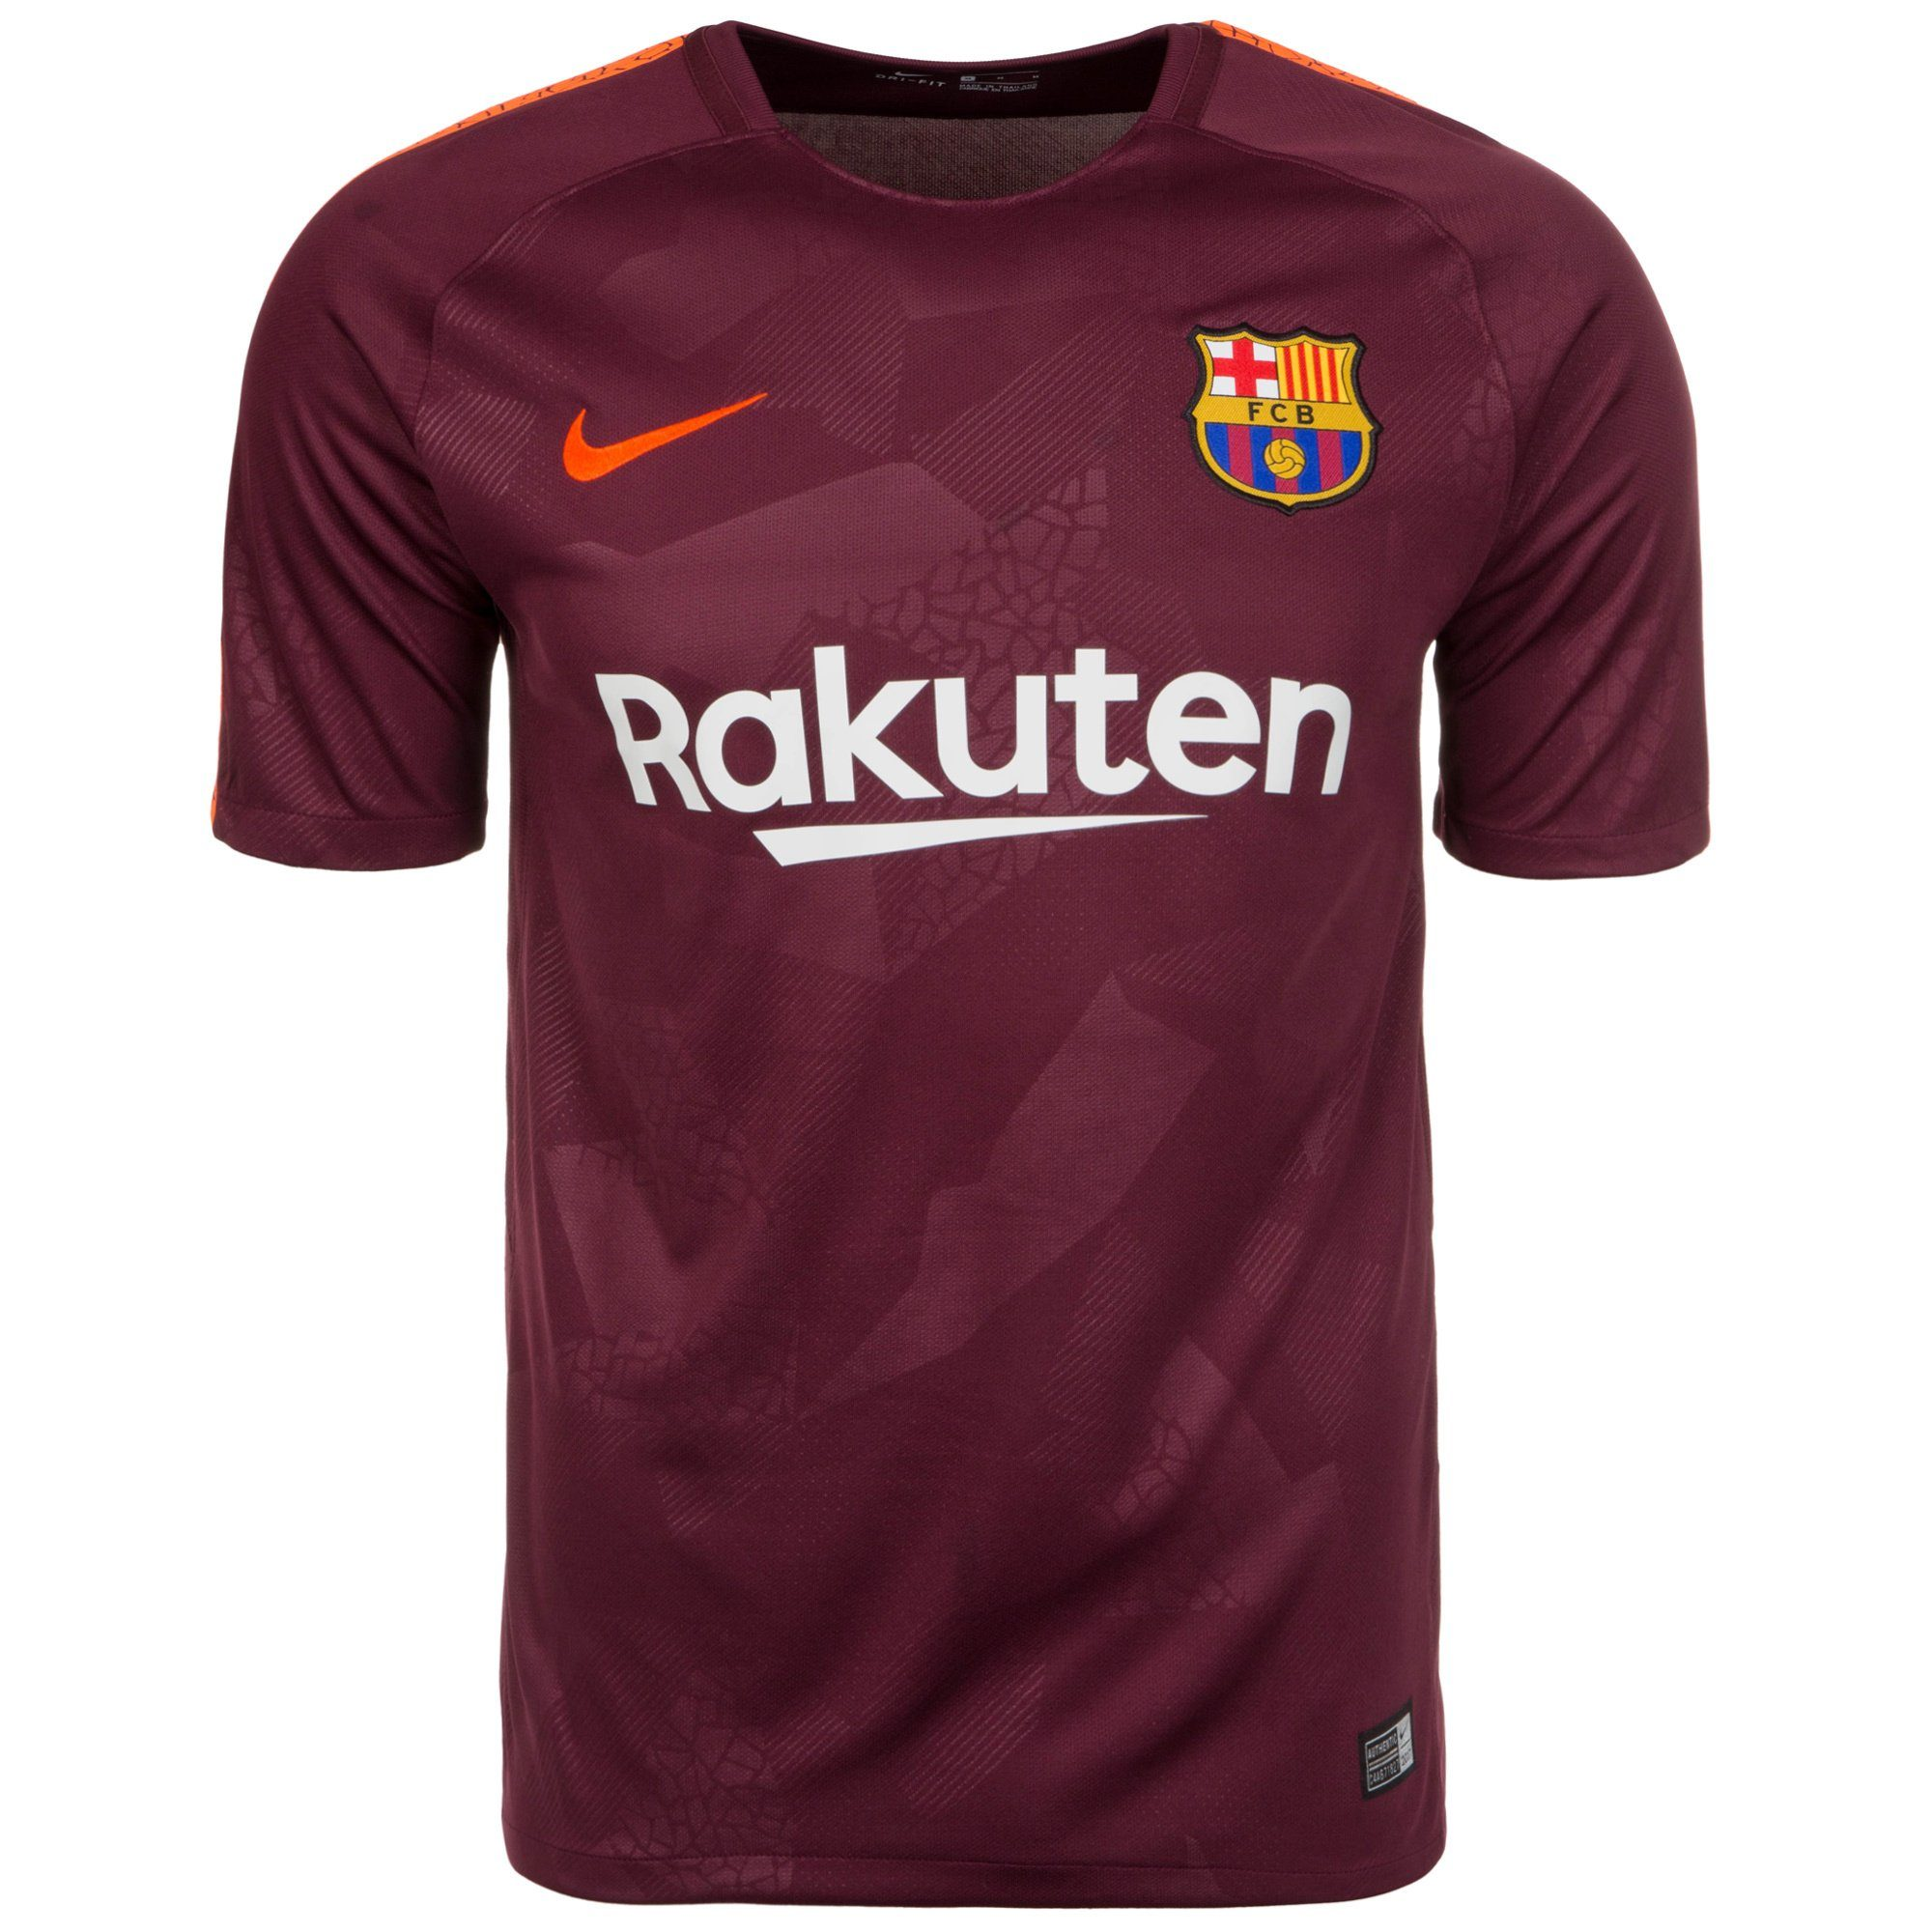 Nike Fußballtrikot Fc Barcelona Stadium 17/18 3rd | Sportbekleidung > Trikots | Rot | Nike